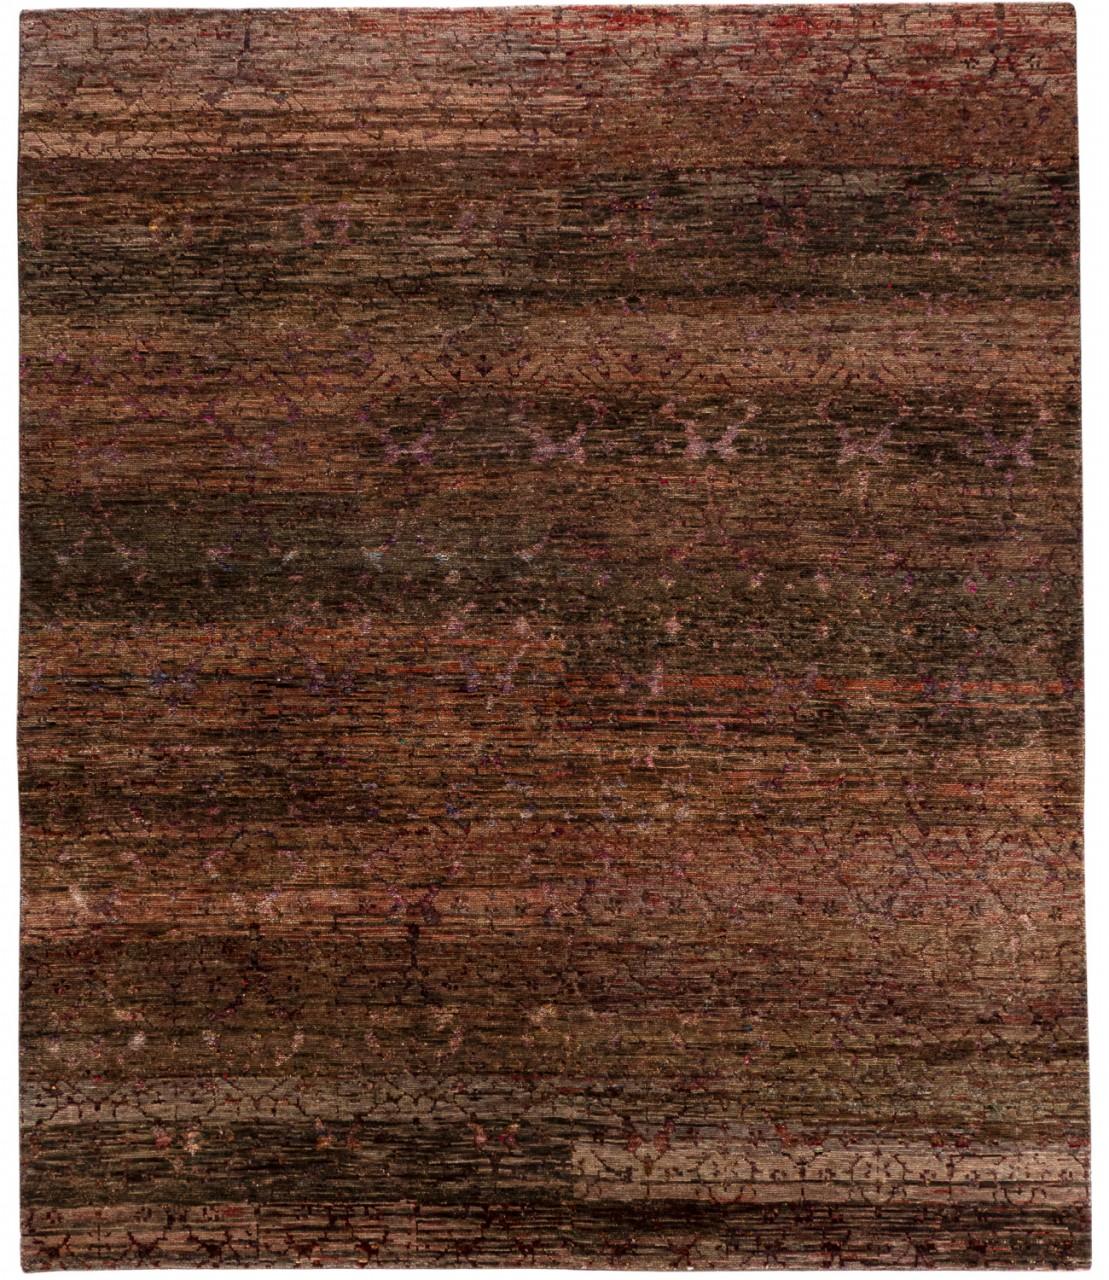 Design-Teppich Romy